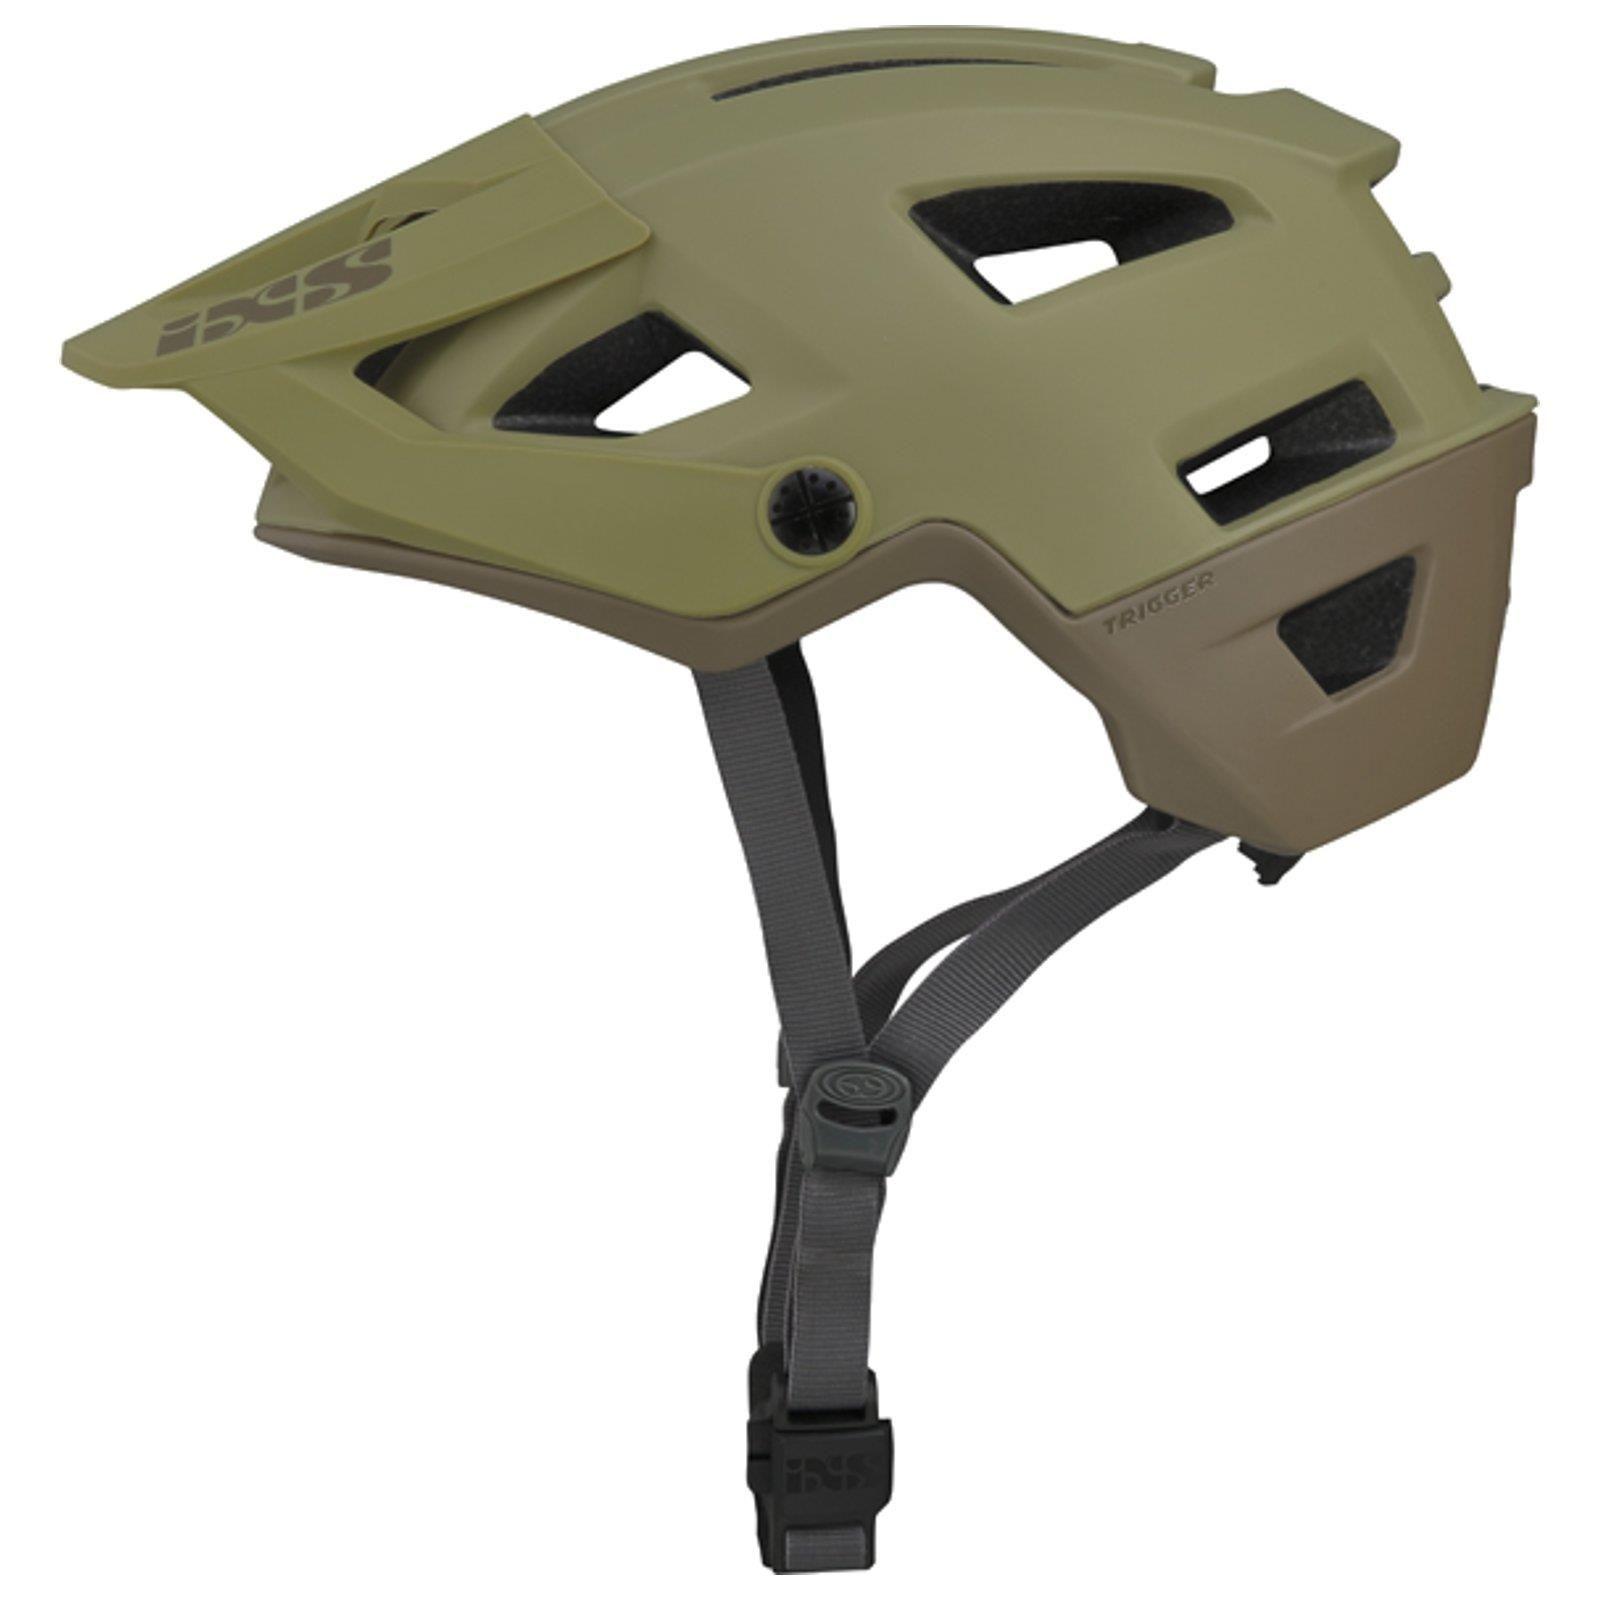 Ixs Trigger Am Fahrrad Helm All Mountain Bike Enduro Dh Downhill Trail Visier Ad Spon Helm Mountain Fahrrad Helmet All Mountain Bike Bicycle Helmet